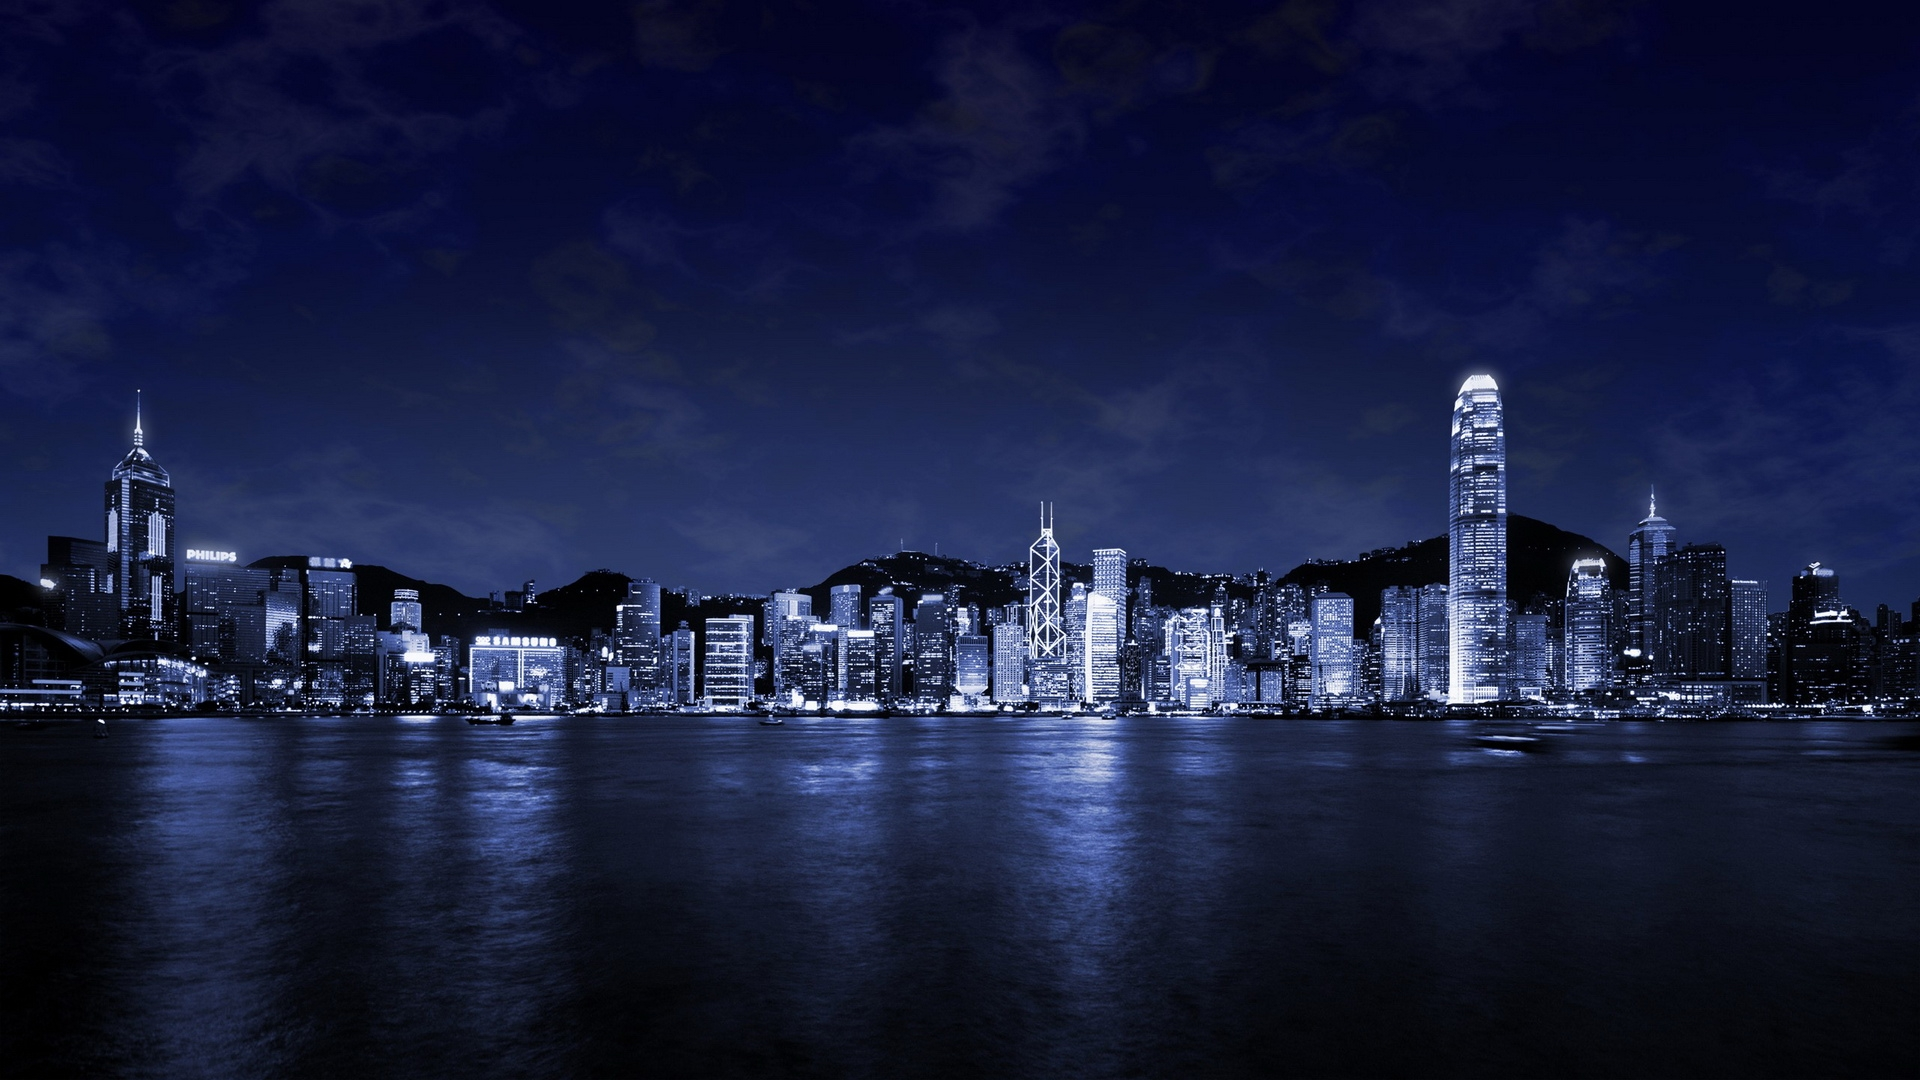 City At Night wallpaper   724296 1920x1080